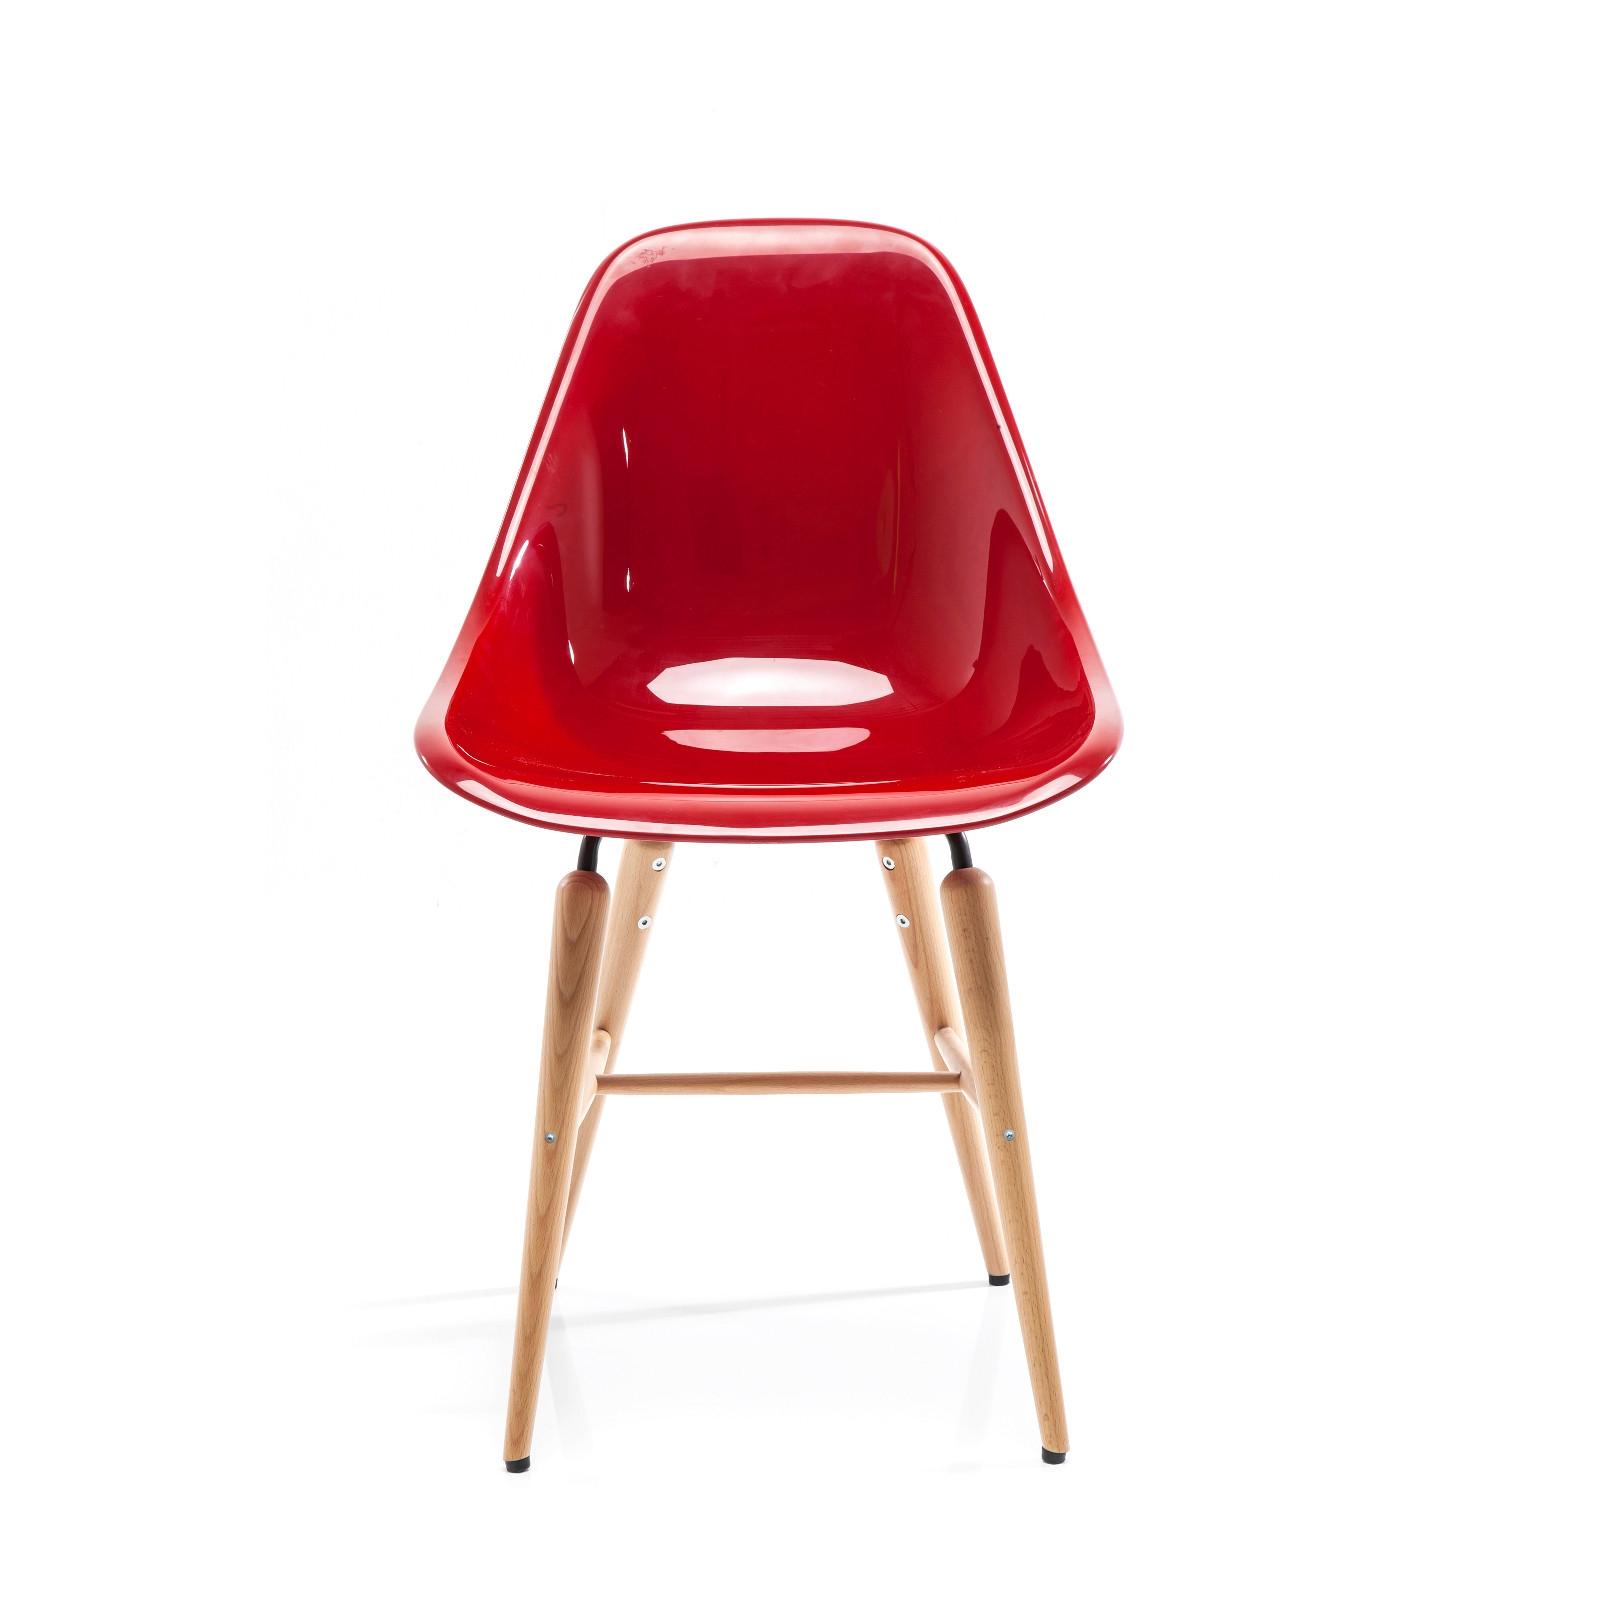 retro design esszimmer stuhl guscio mit sitzschale und buchenholzf e rot ebay. Black Bedroom Furniture Sets. Home Design Ideas